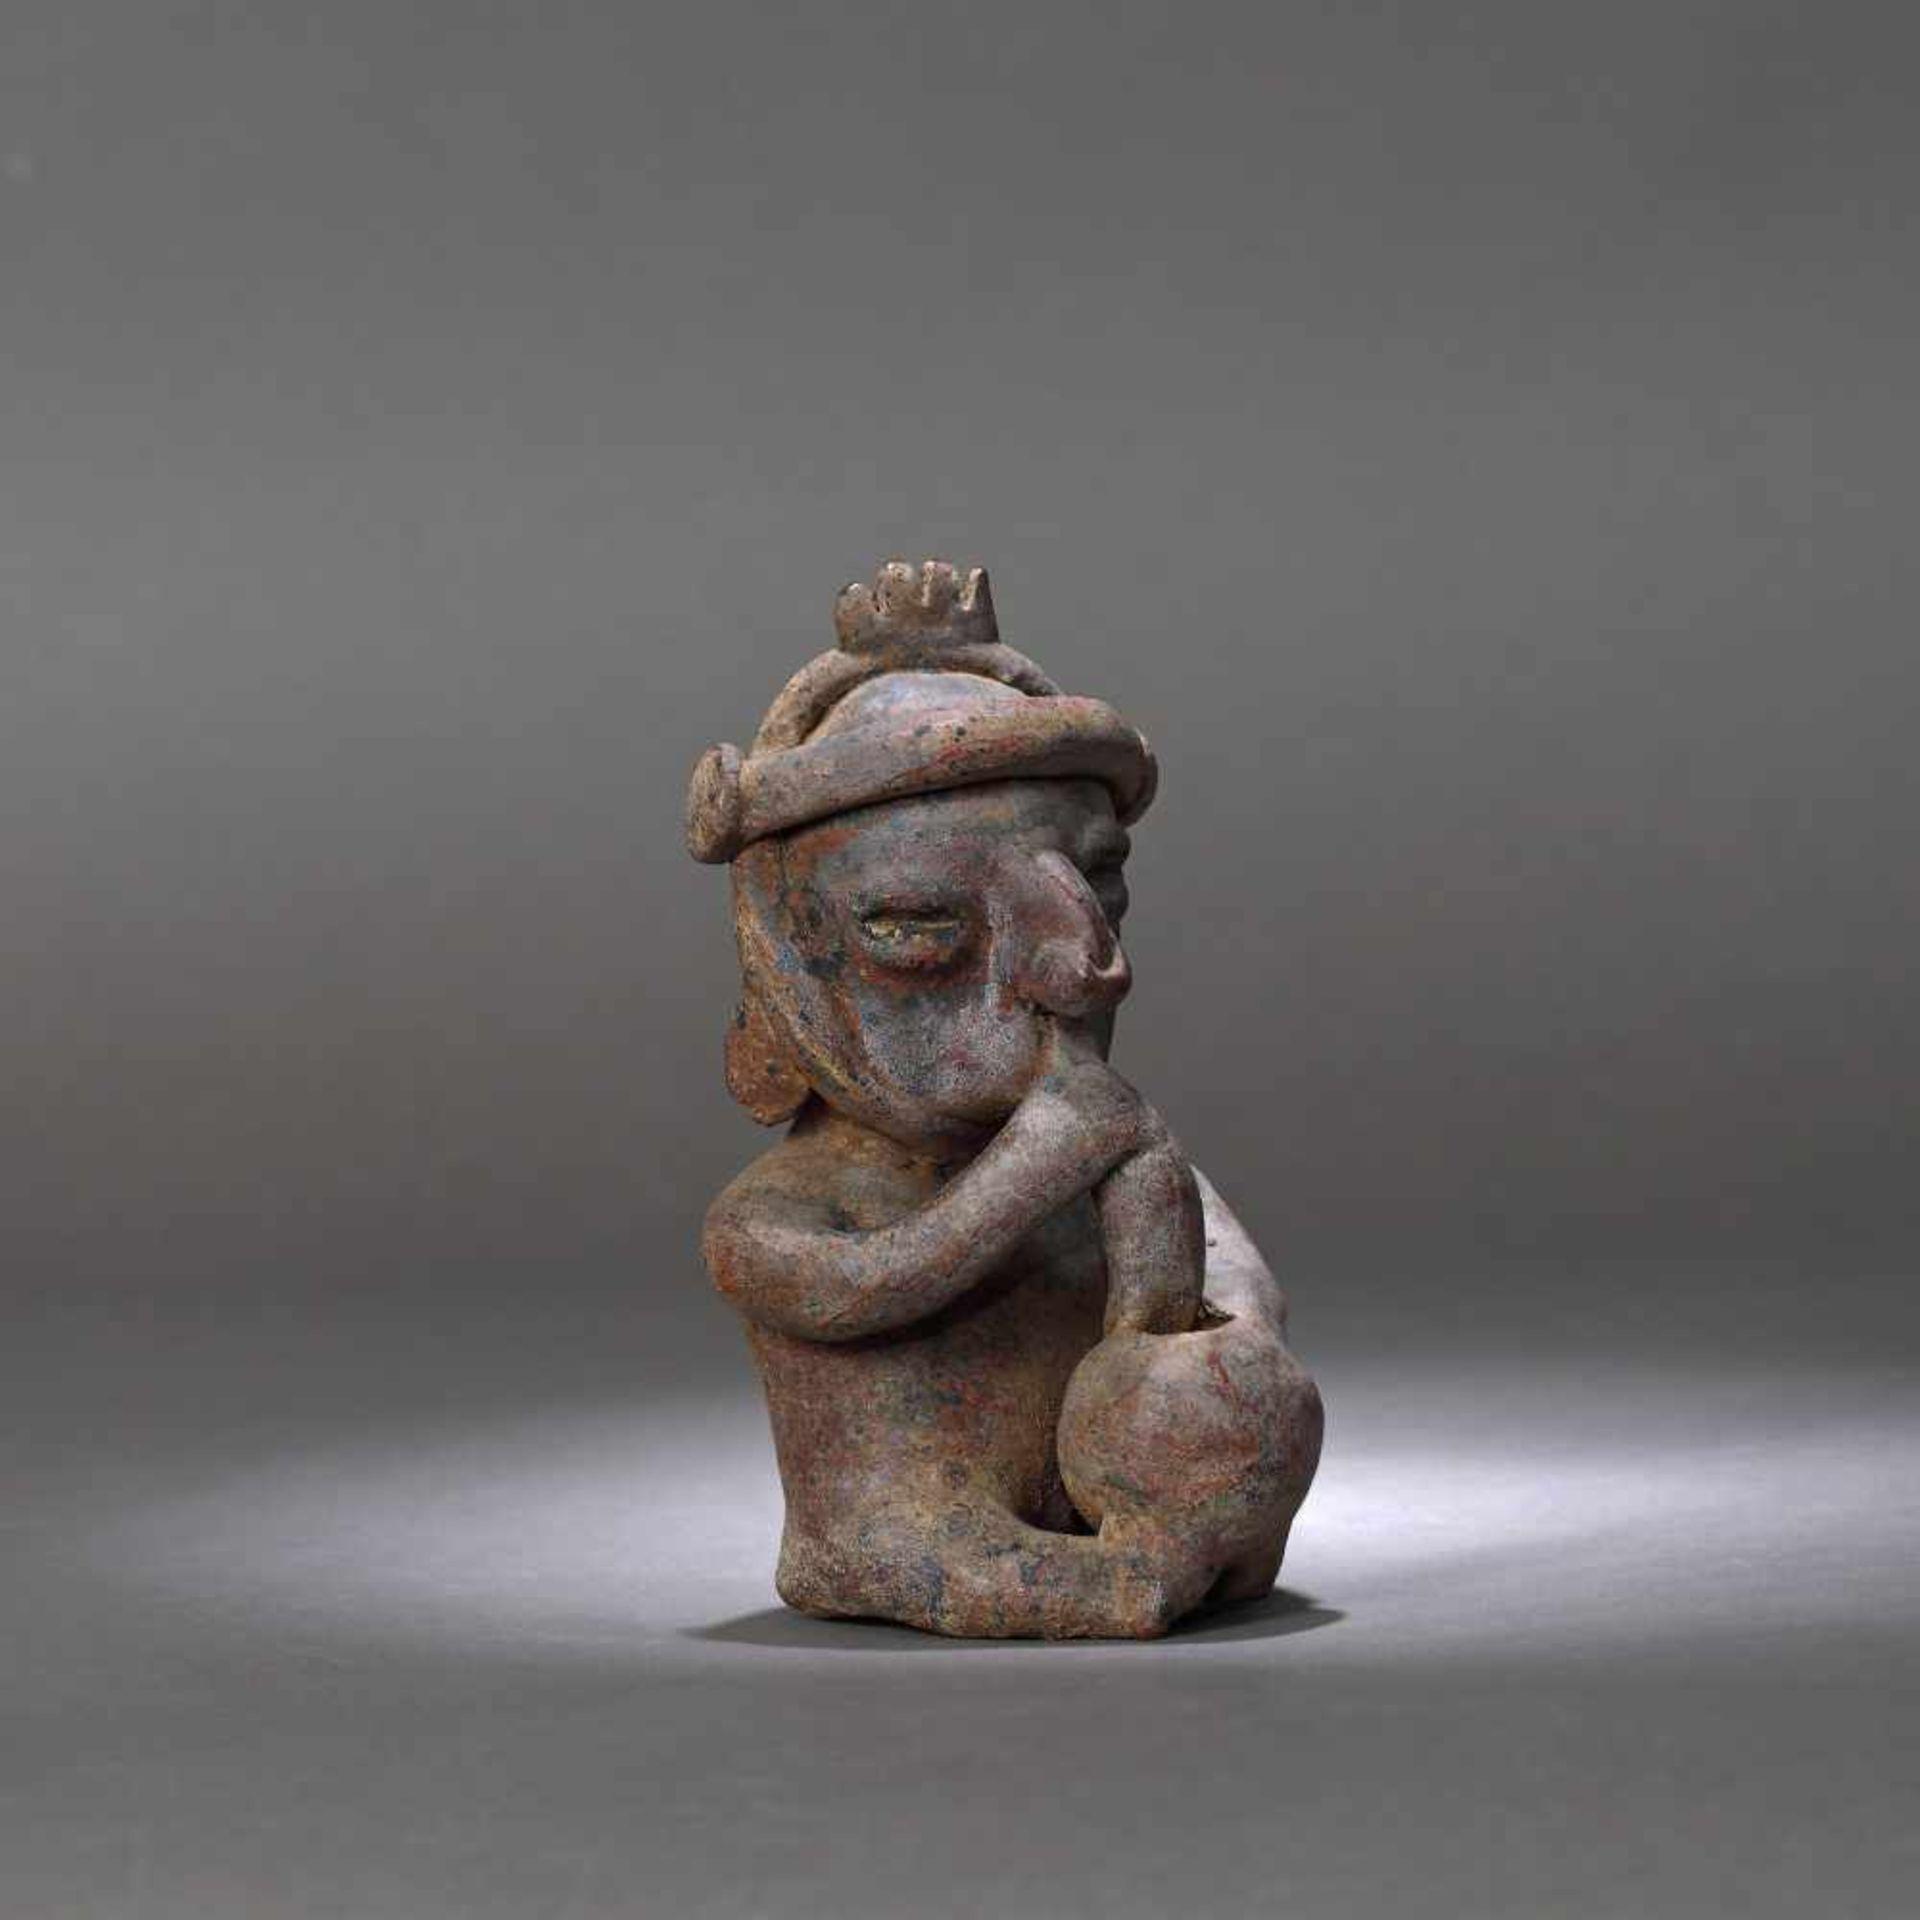 Ceramic figurine depicting a man smoking, Colima culture, Mexico, approx. 2,000 years old, 1st centu - Bild 4 aus 6